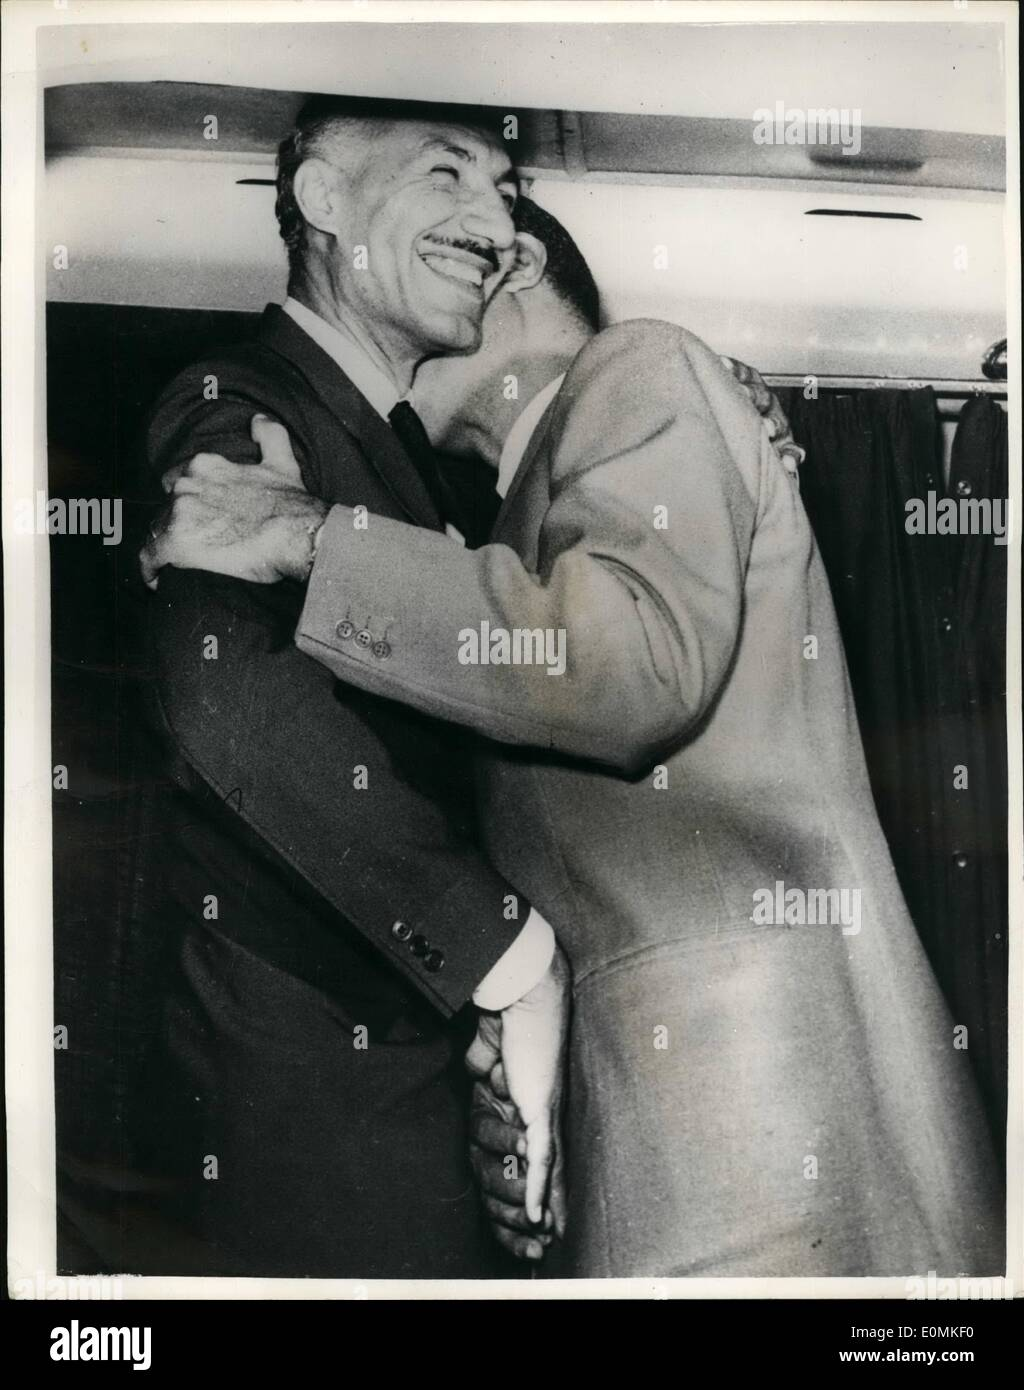 Oct. 10, 1955 - Gamal Salem - Egypt's Deputy Premier Greeted by Colonel Nasser on Return from Asia.: Egypt's - Stock Image